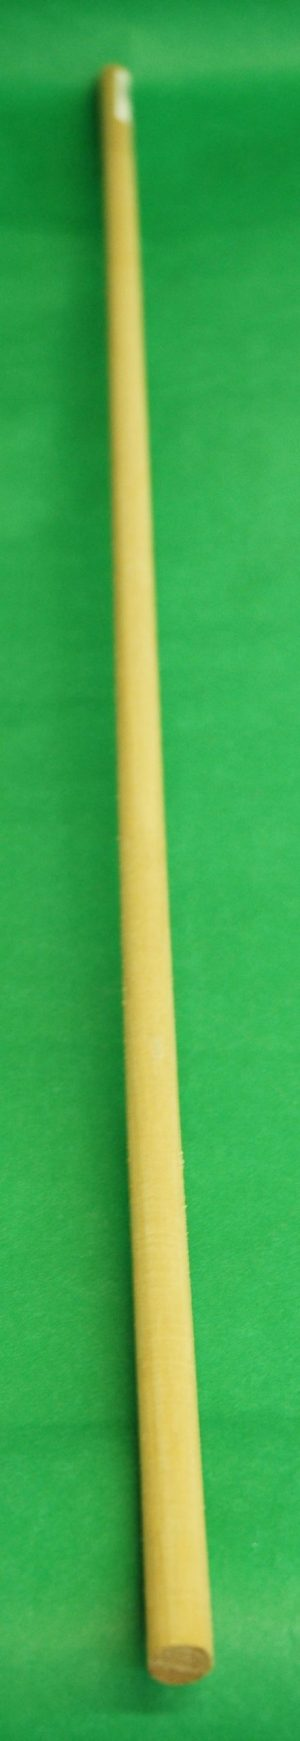 p 3990 DOWEL